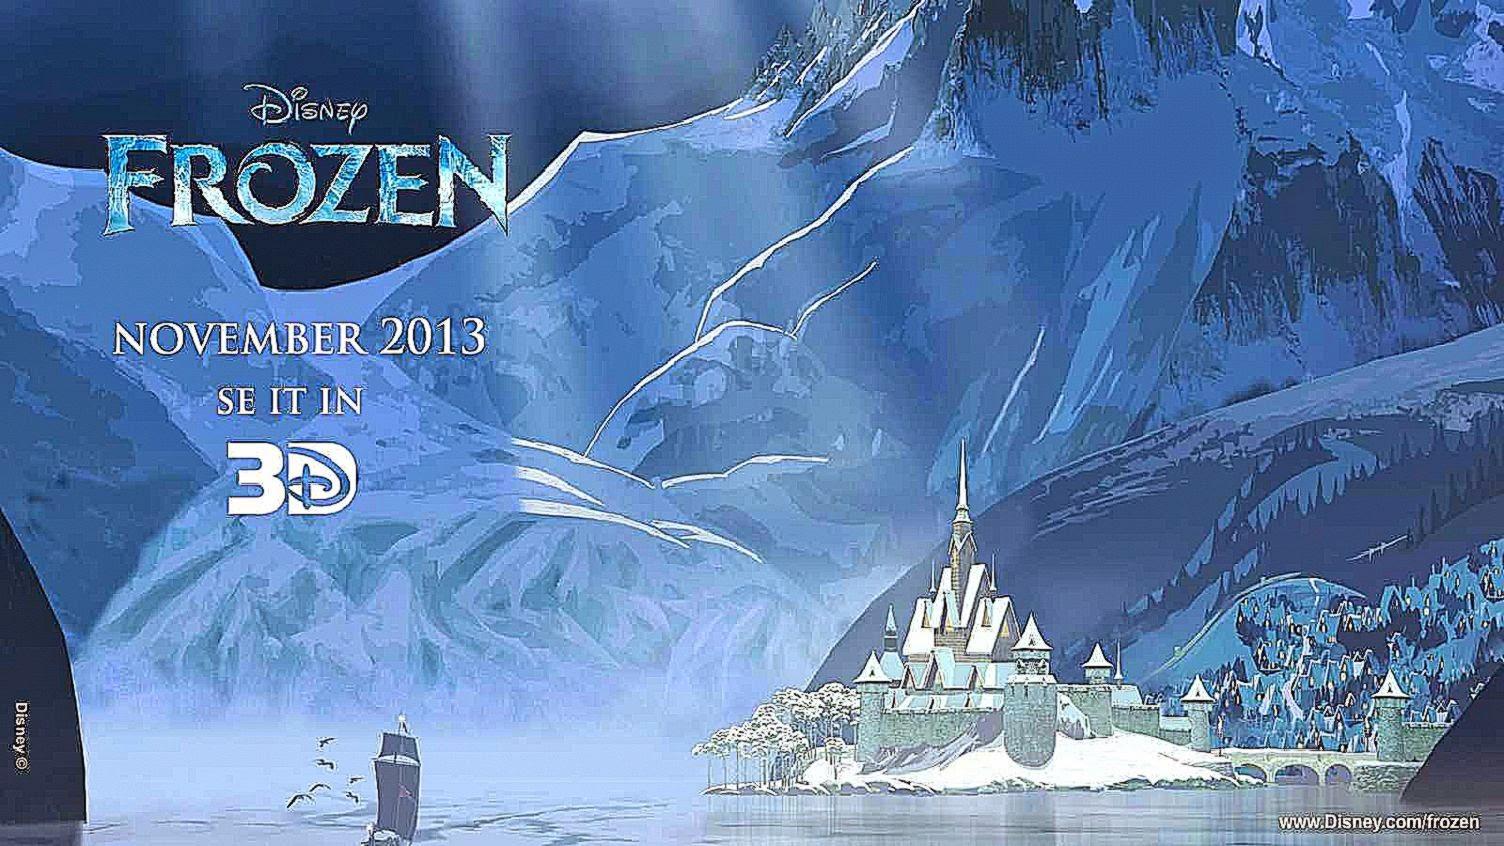 Frozen 3D Movie Wallpaper Hd View Wallpapers 1504x846